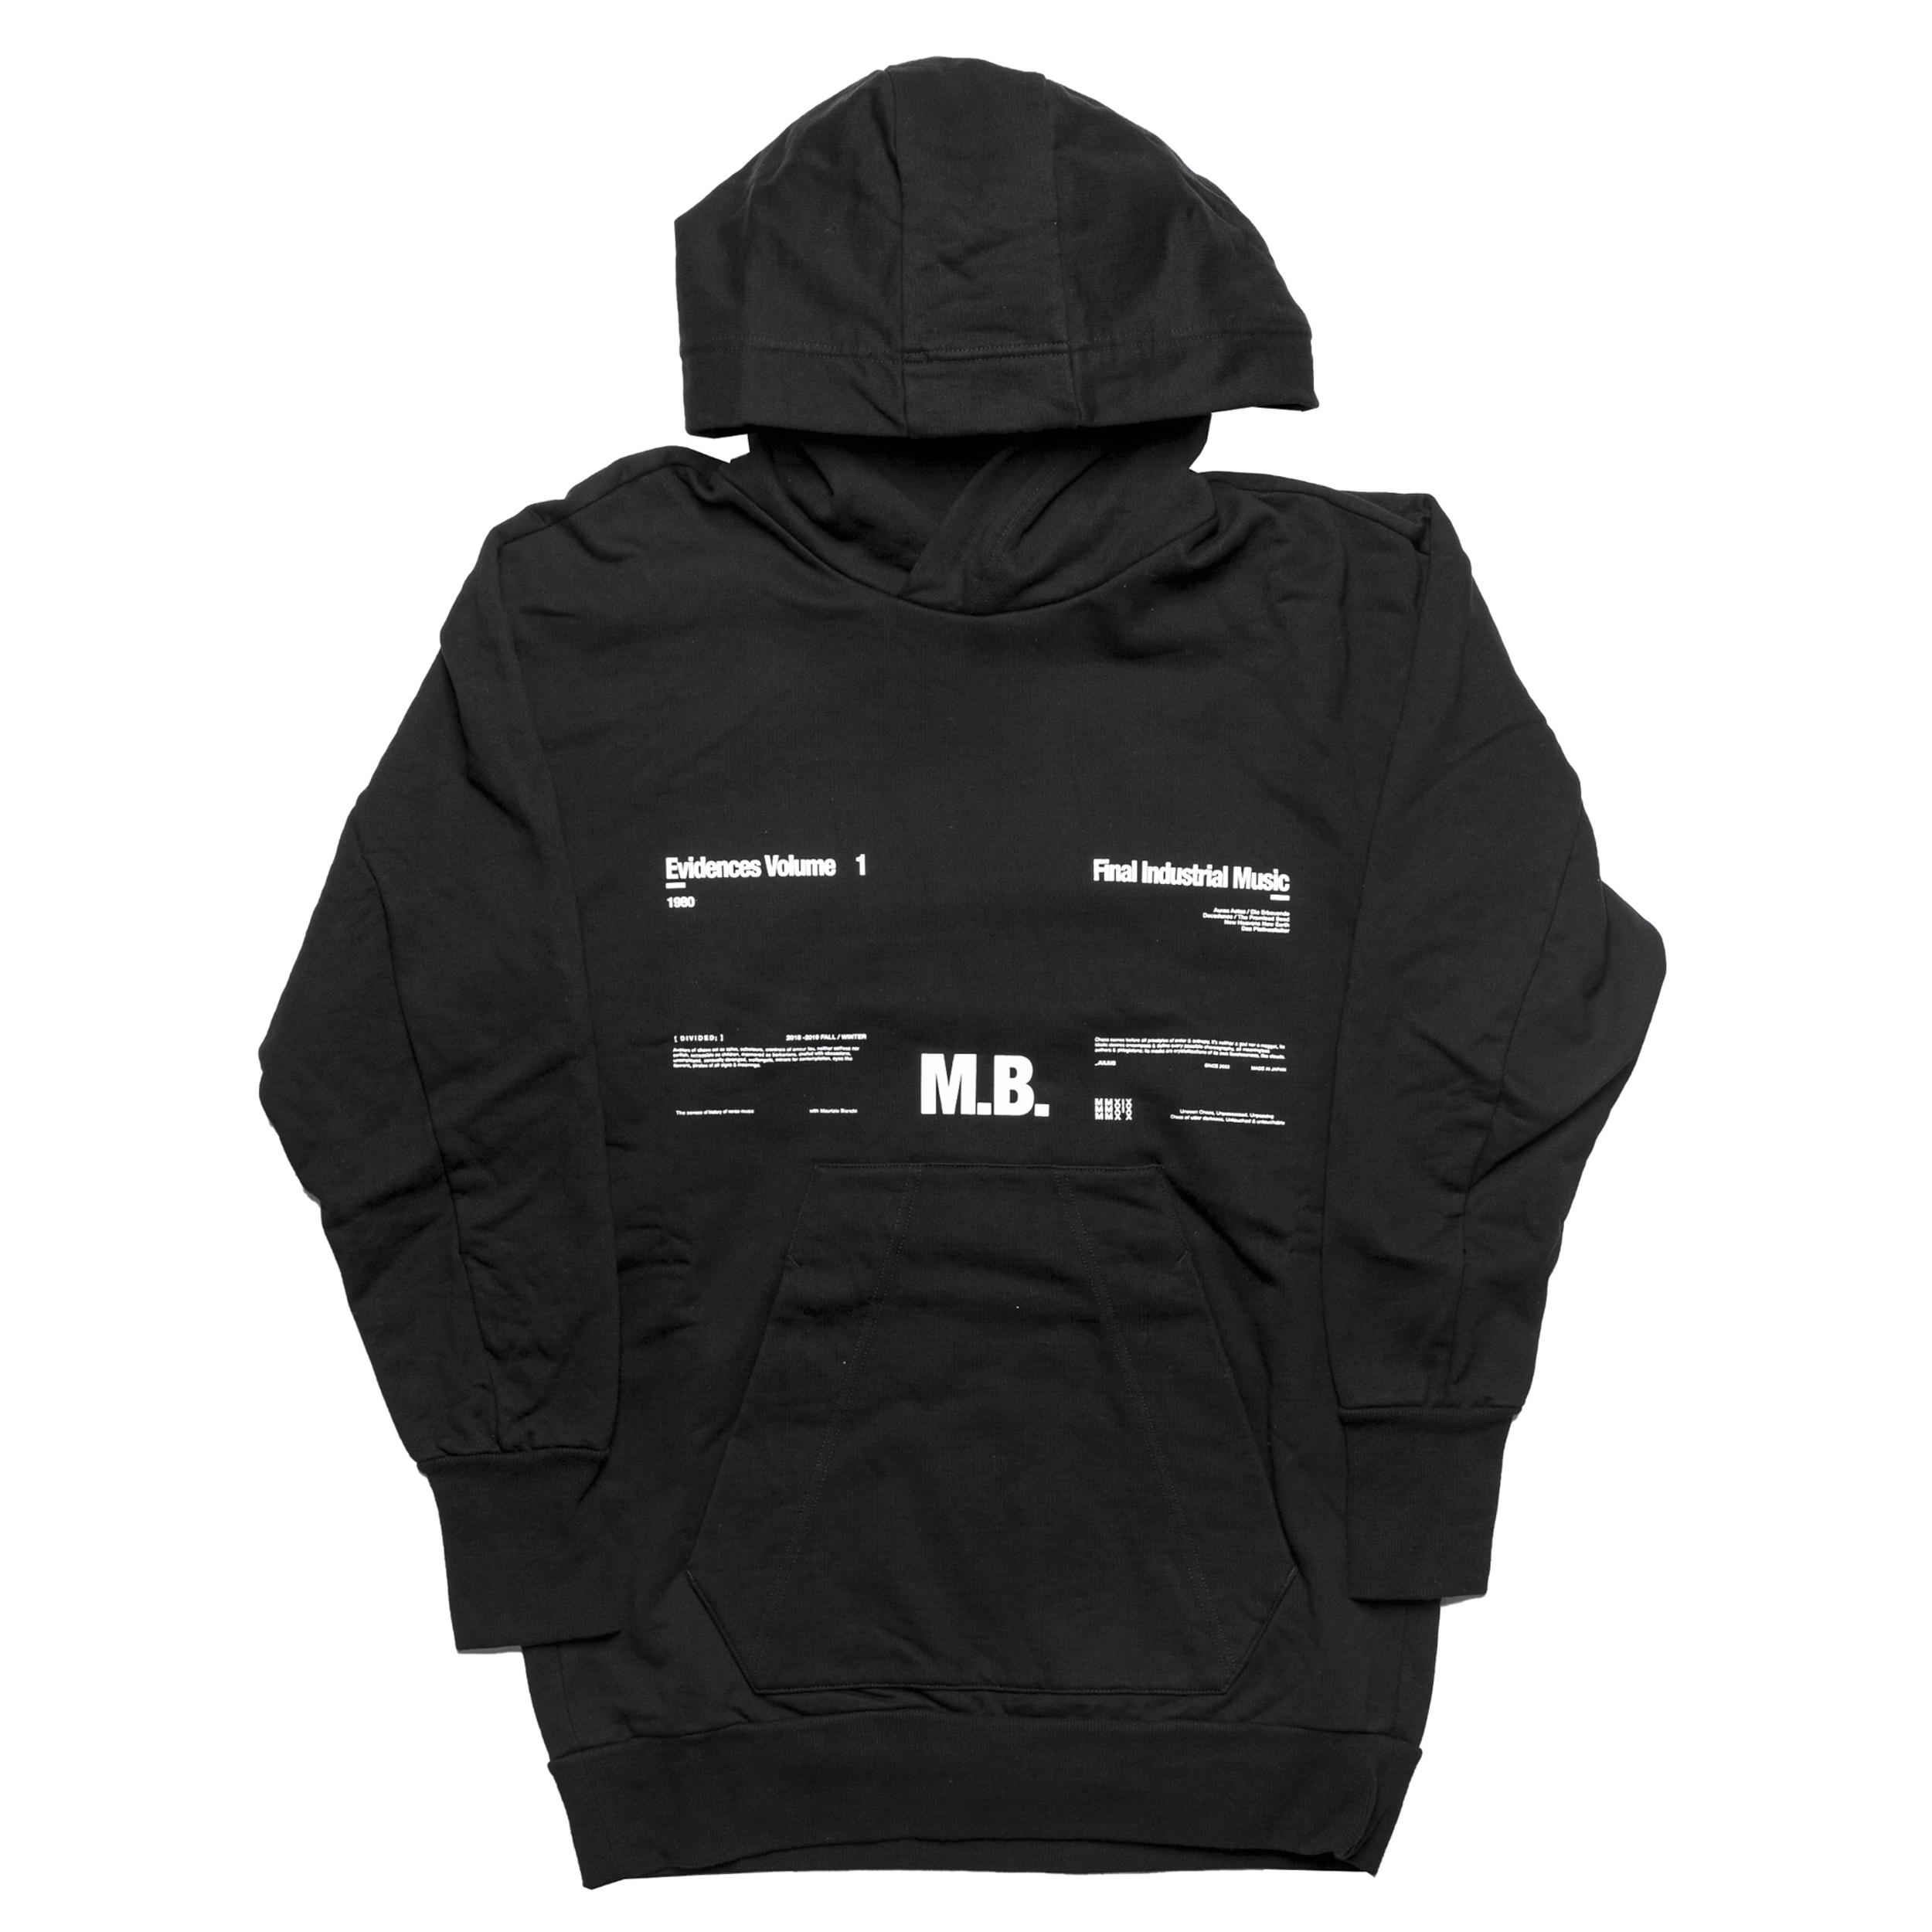 677CPM1-BLACK / M. B. ビッグフーディ